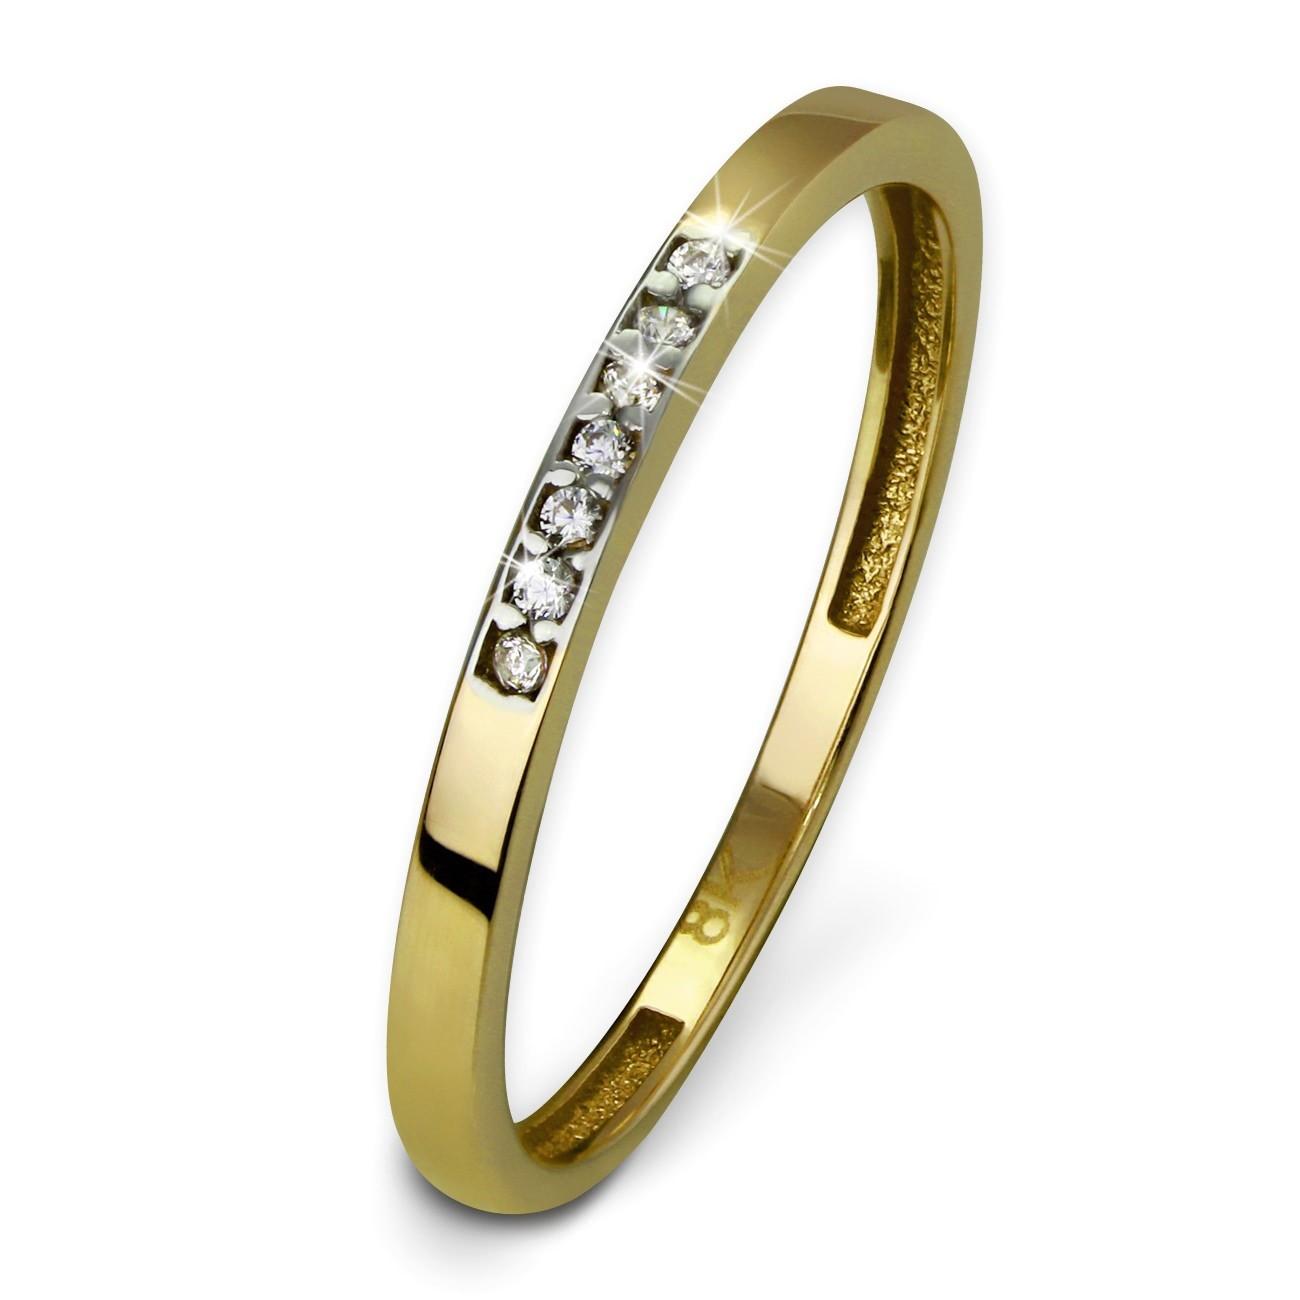 GoldDream Gold Ring Zirkonia weiß Gr.54 333er Gelbgold GDR502Y54